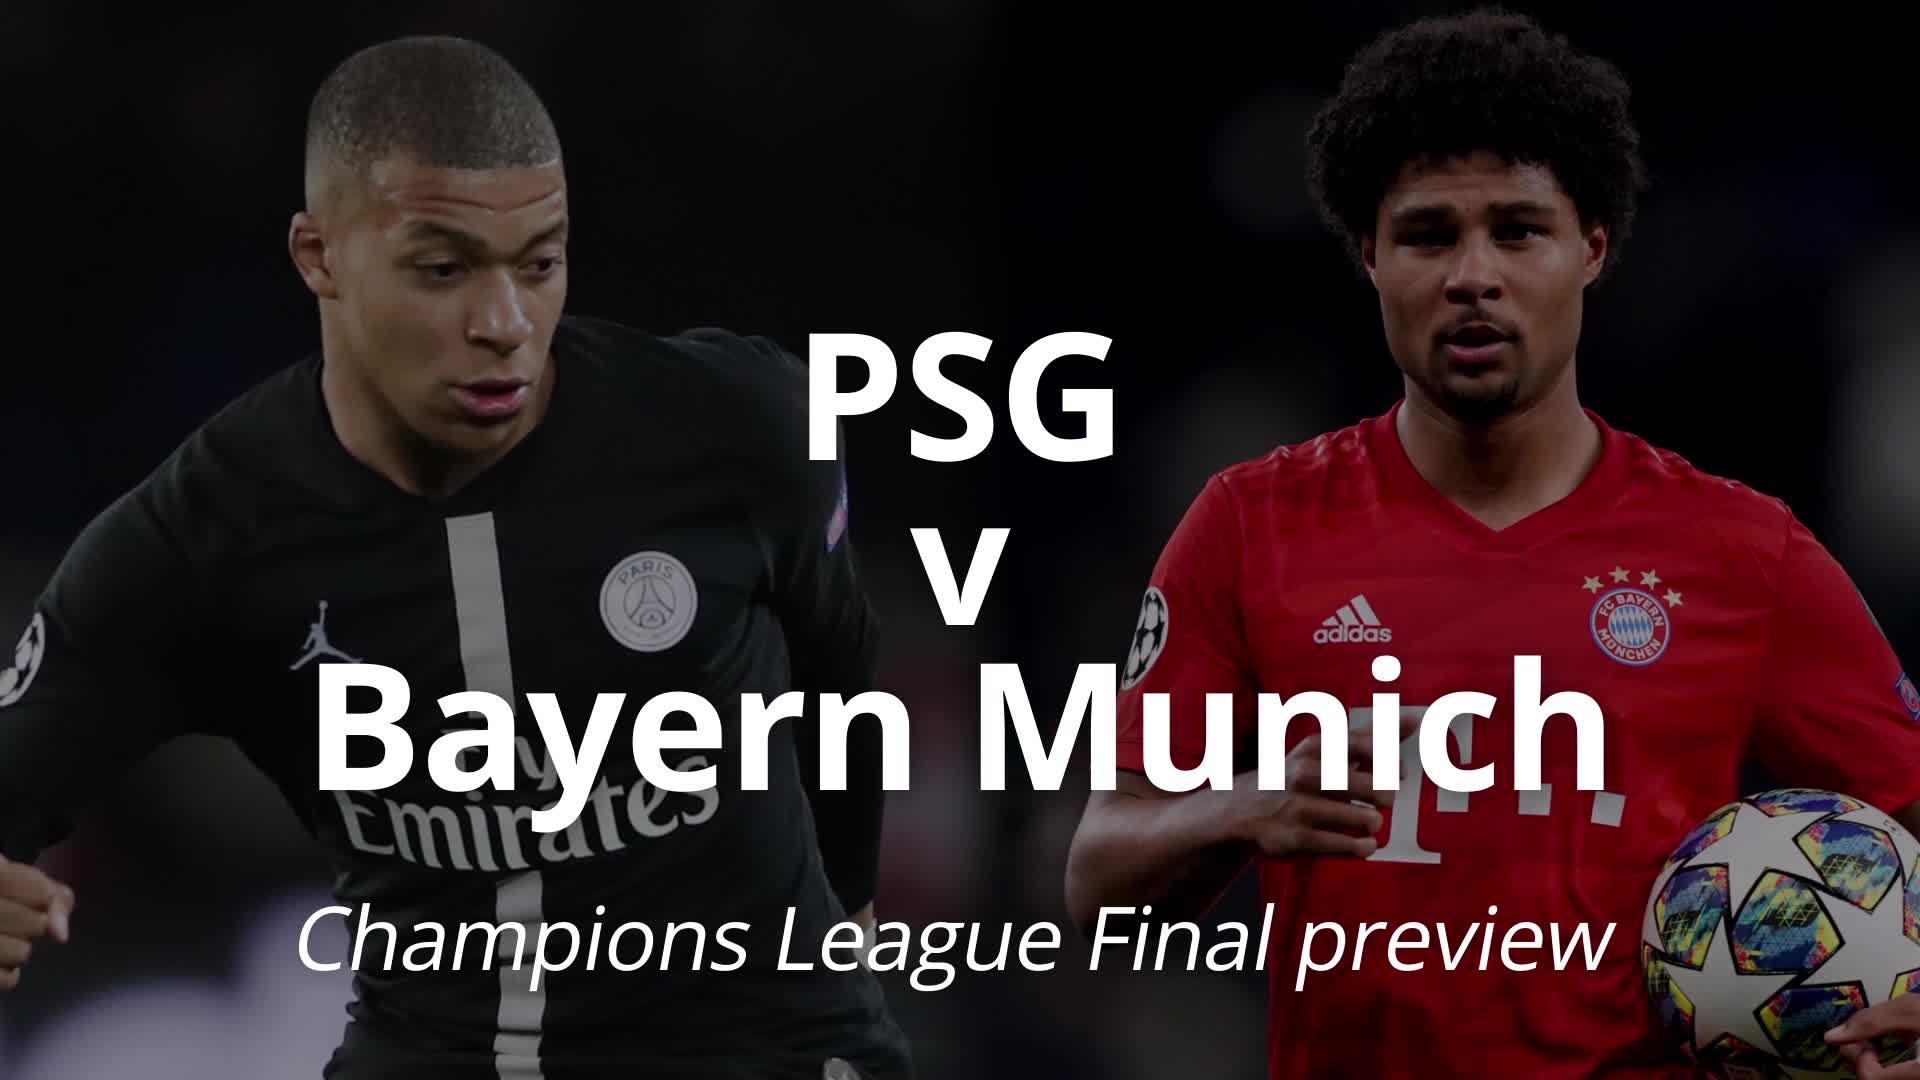 Psg V Bayern Munich Champions League Final Preview Video